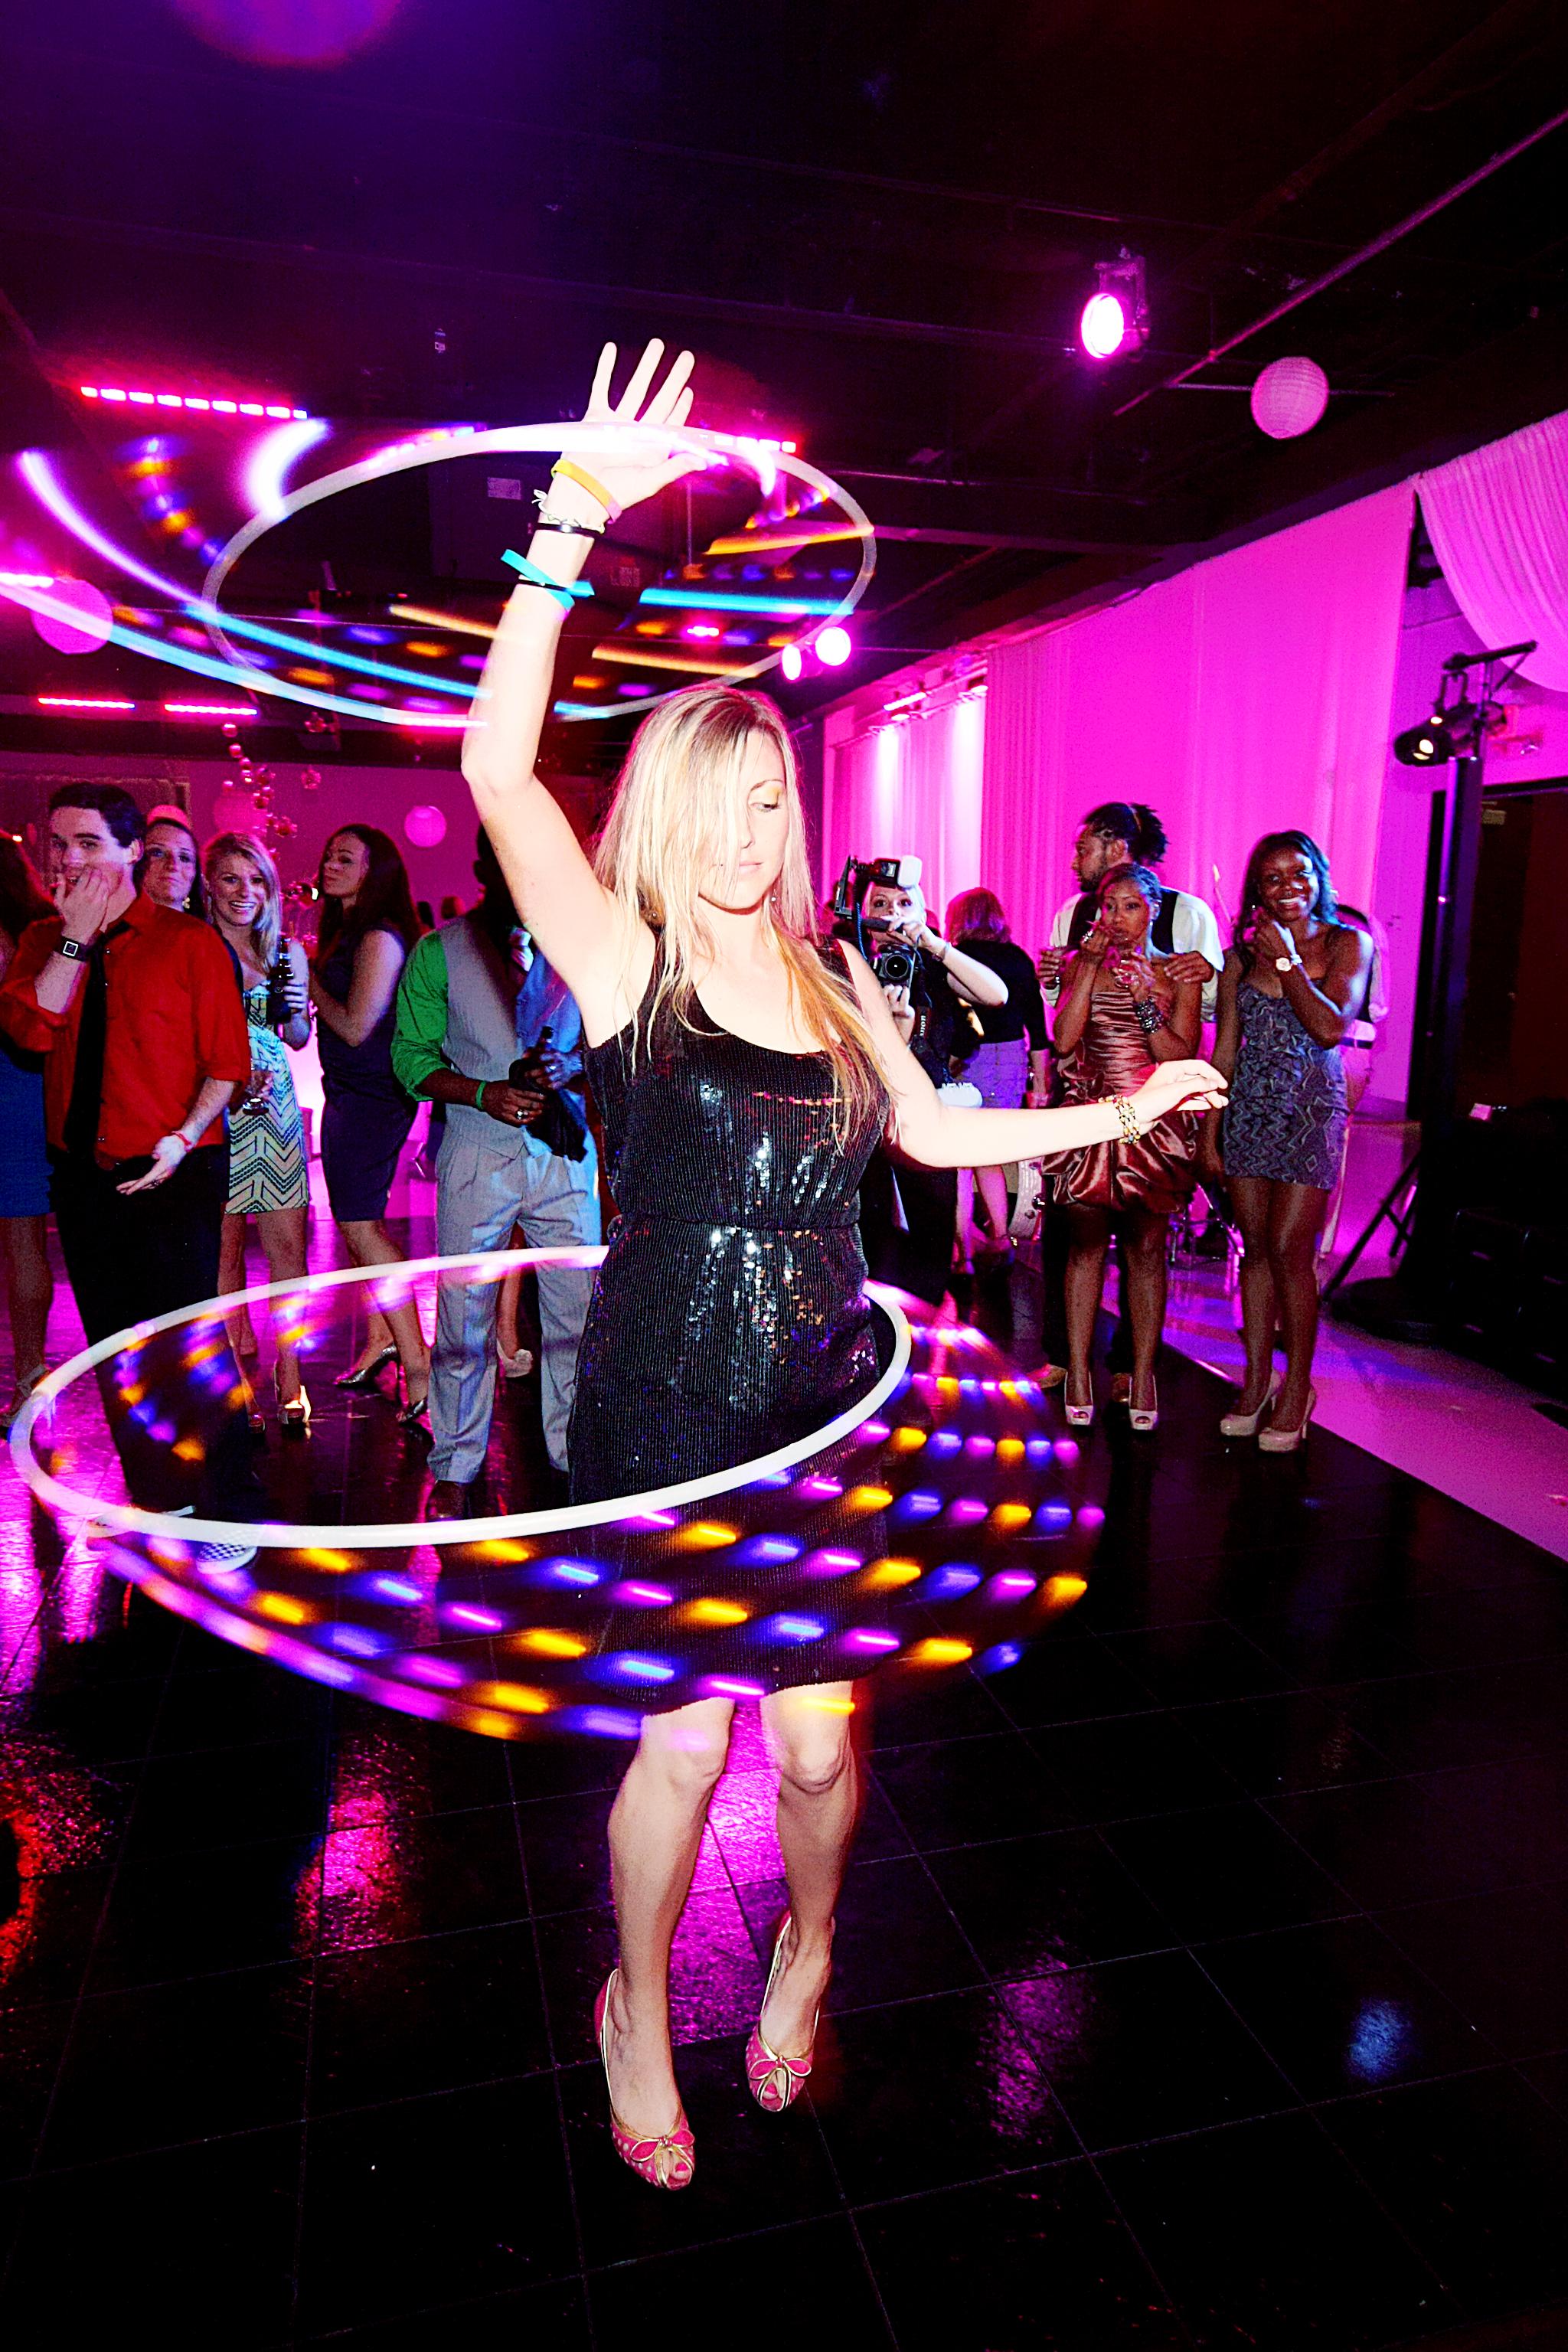 Light Up Hoola Hoops at wedding reception